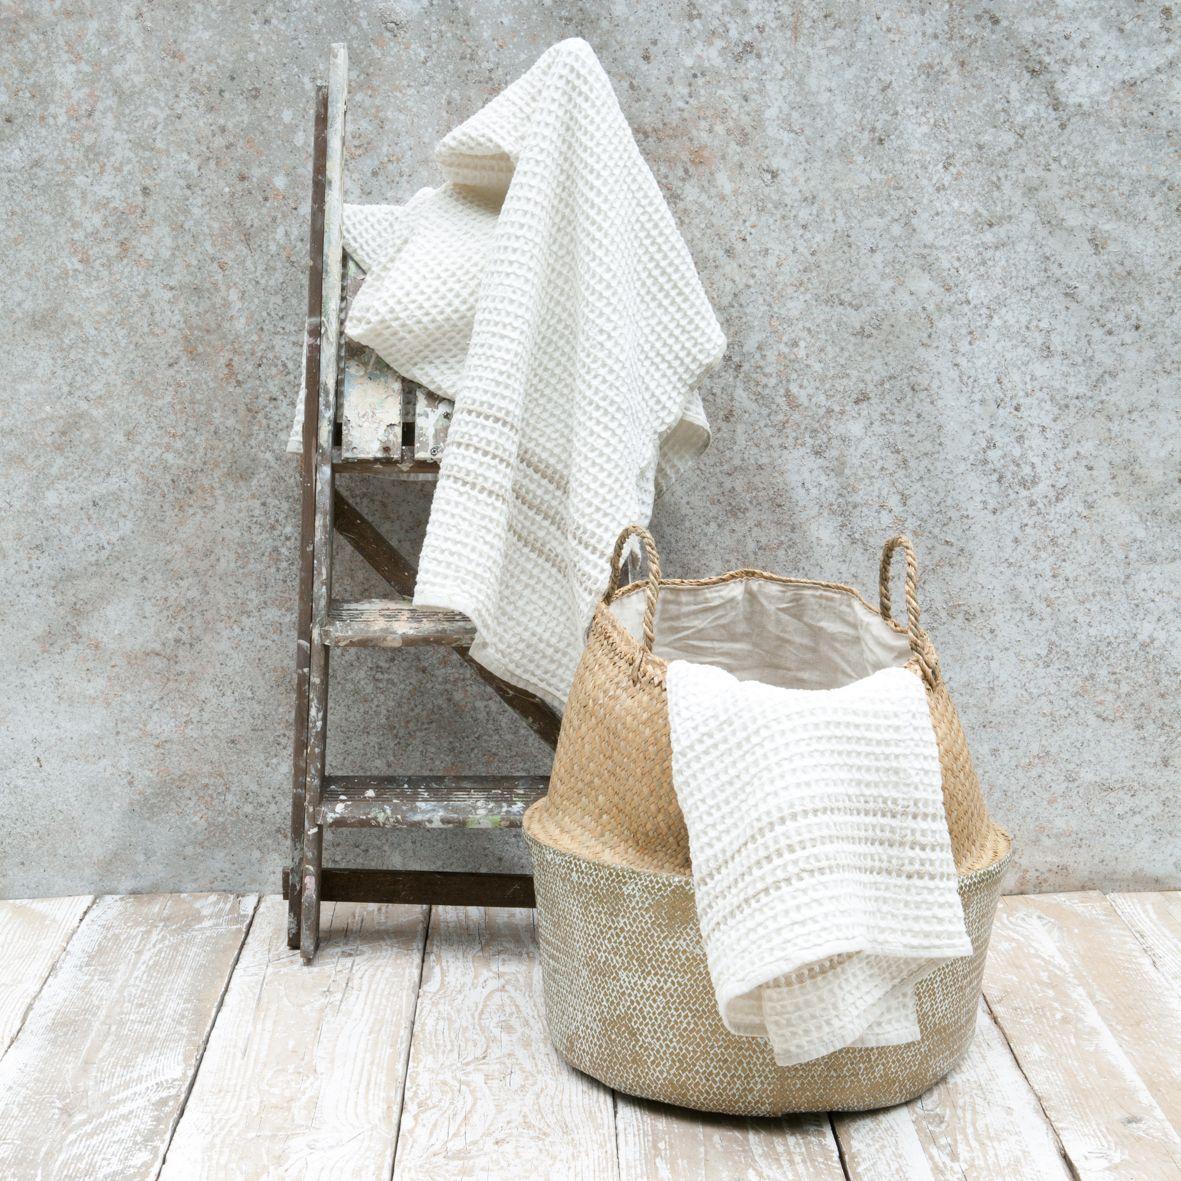 imani_waffle_bath_towel_oatmeal_ke095_1.jpg